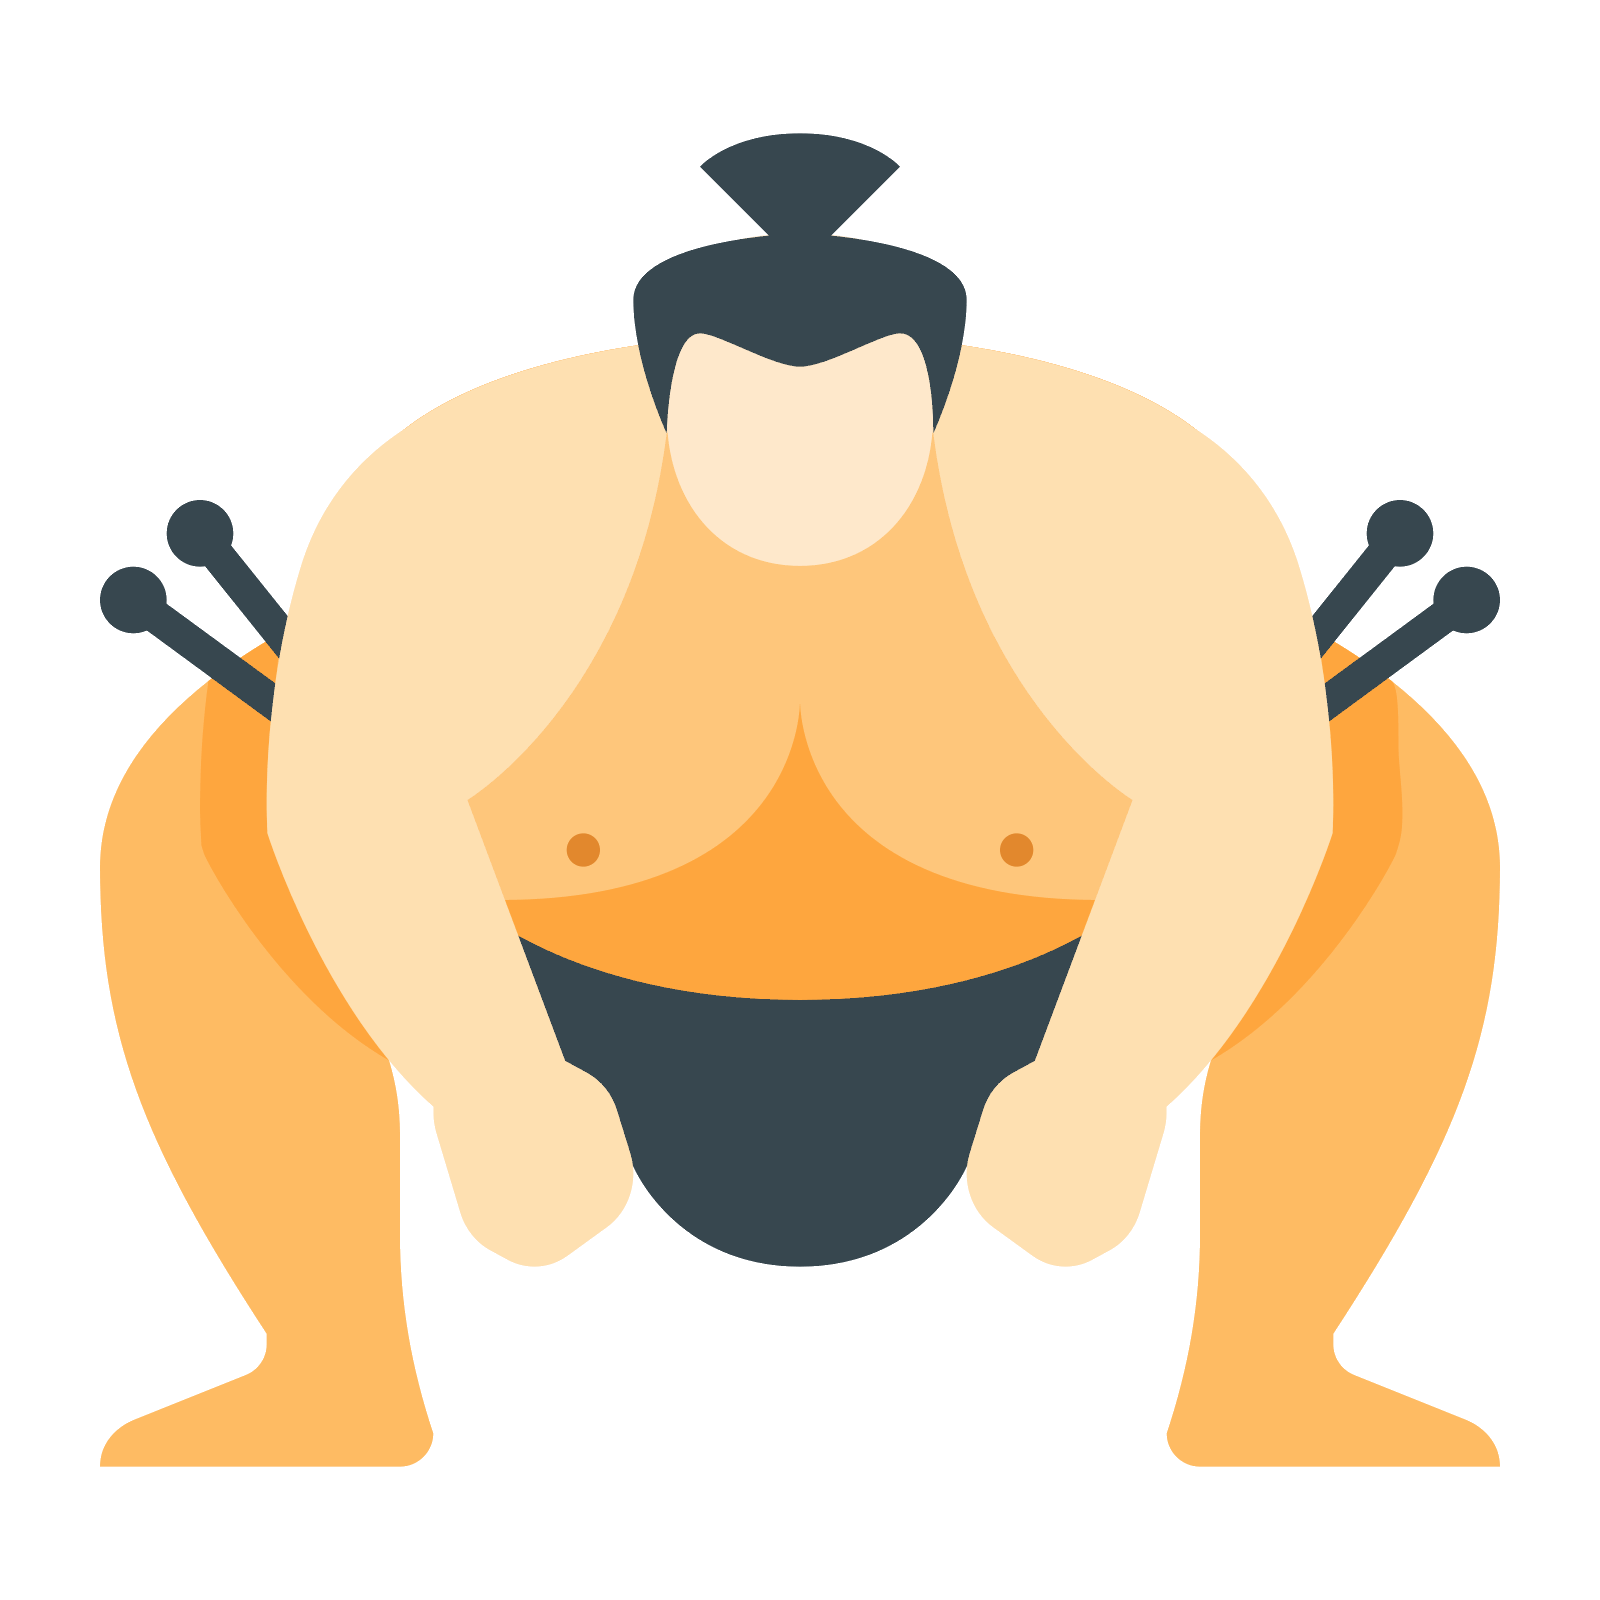 1600x1600 15 Muscle Emoji Vector Png For Free Download On Mbtskoudsalg